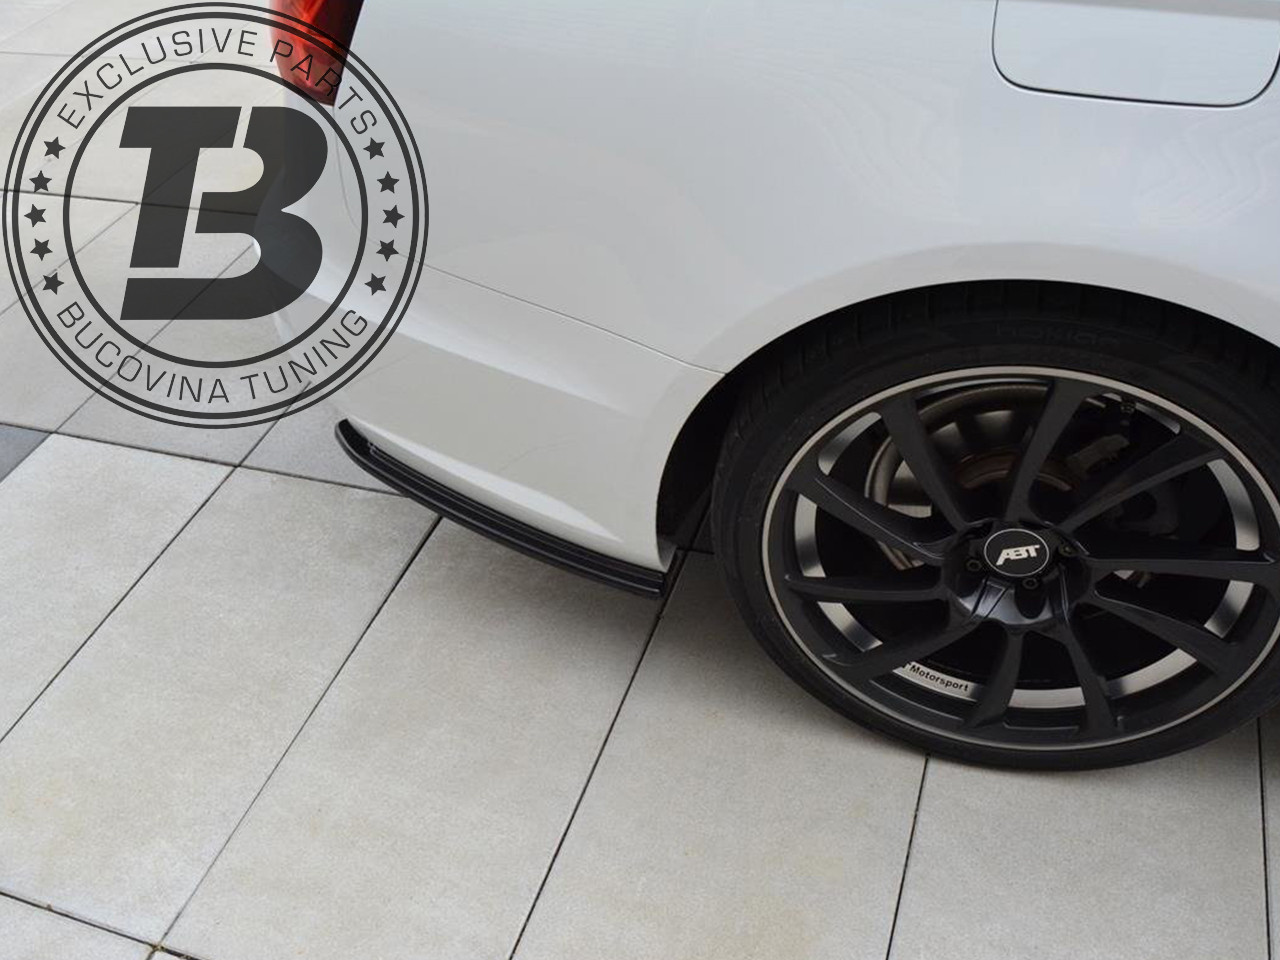 Extensii laterale bara spate splitter Audi S6 4G /A6 4G S line Facelift Avant (14-18) Maxton Design